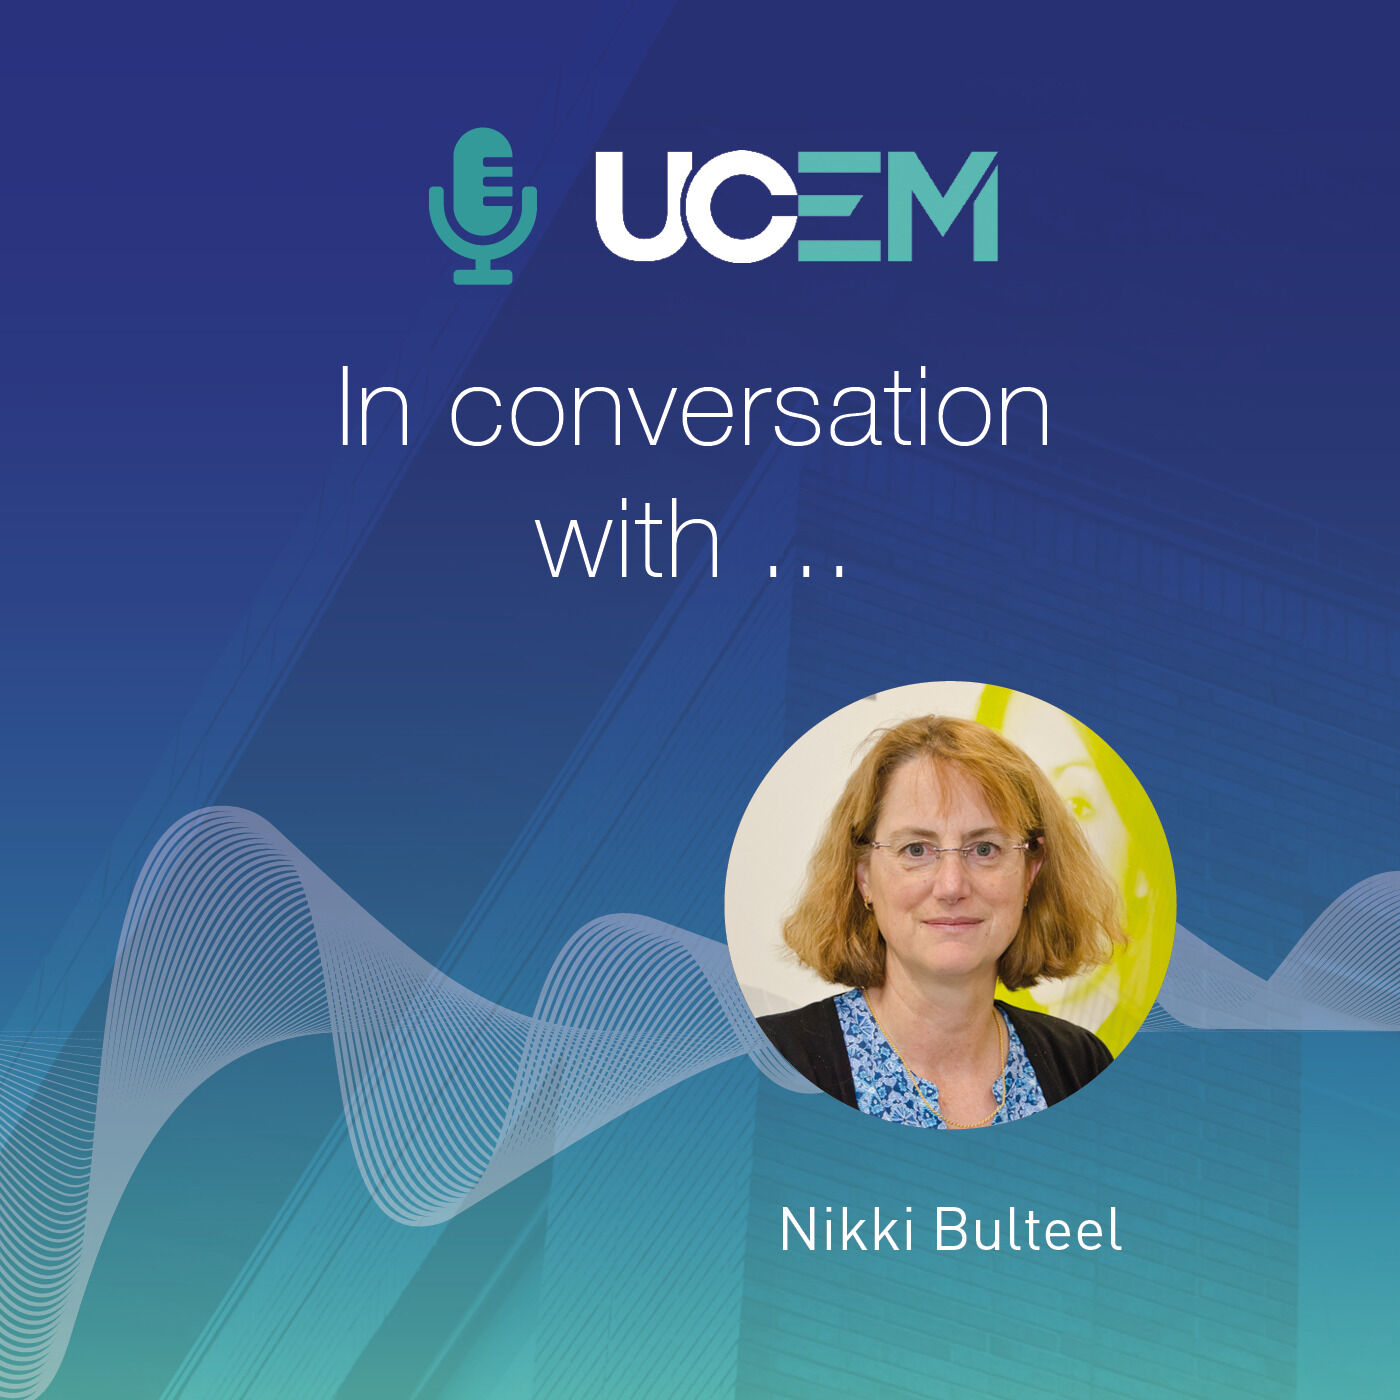 UCEM in conversation with... Nikki Bulteel - Episode 4